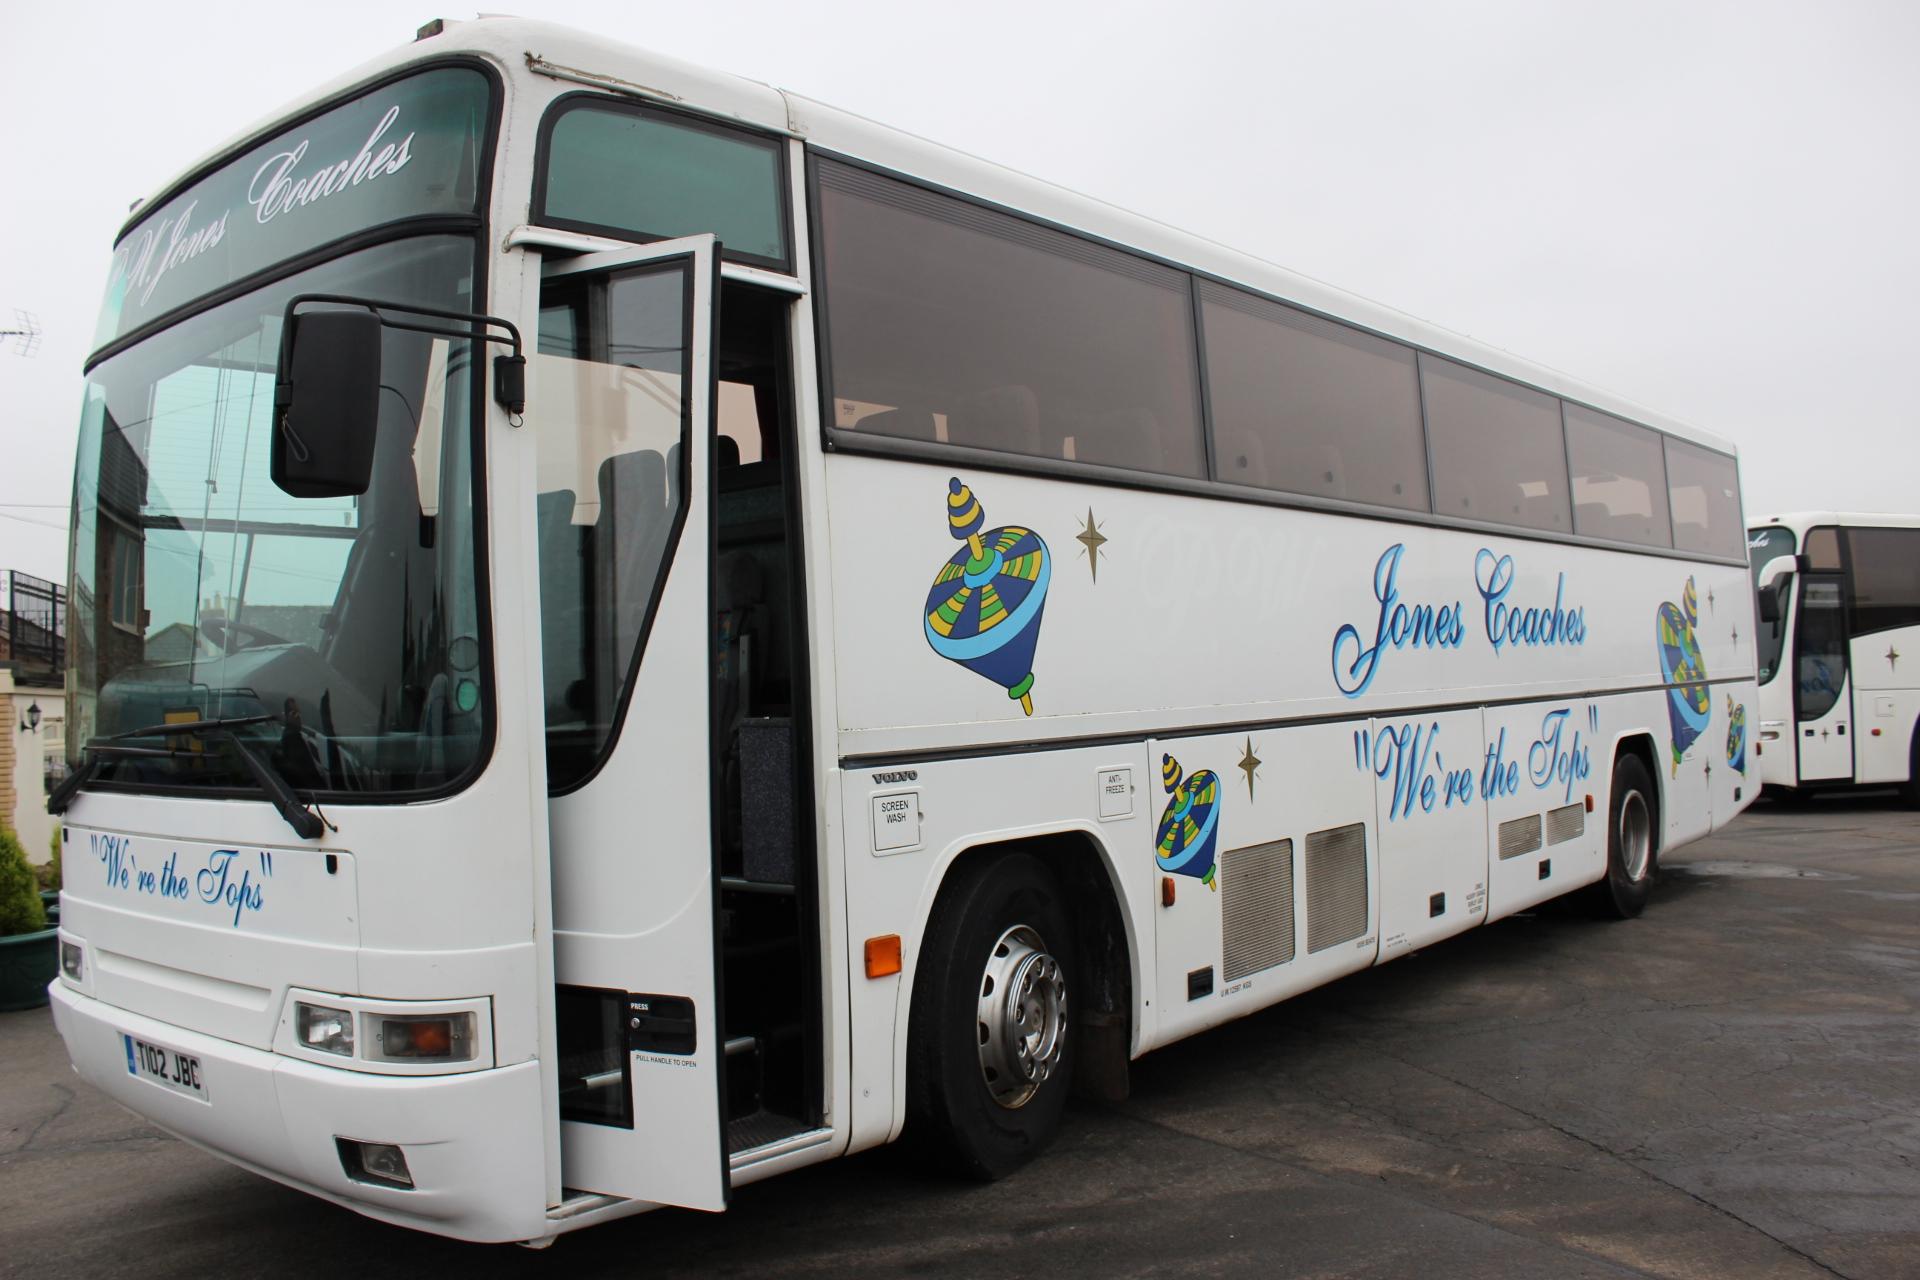 99 VOLVO B10M PLAXTON PREMIERE 350 53 STS - Hills Coaches